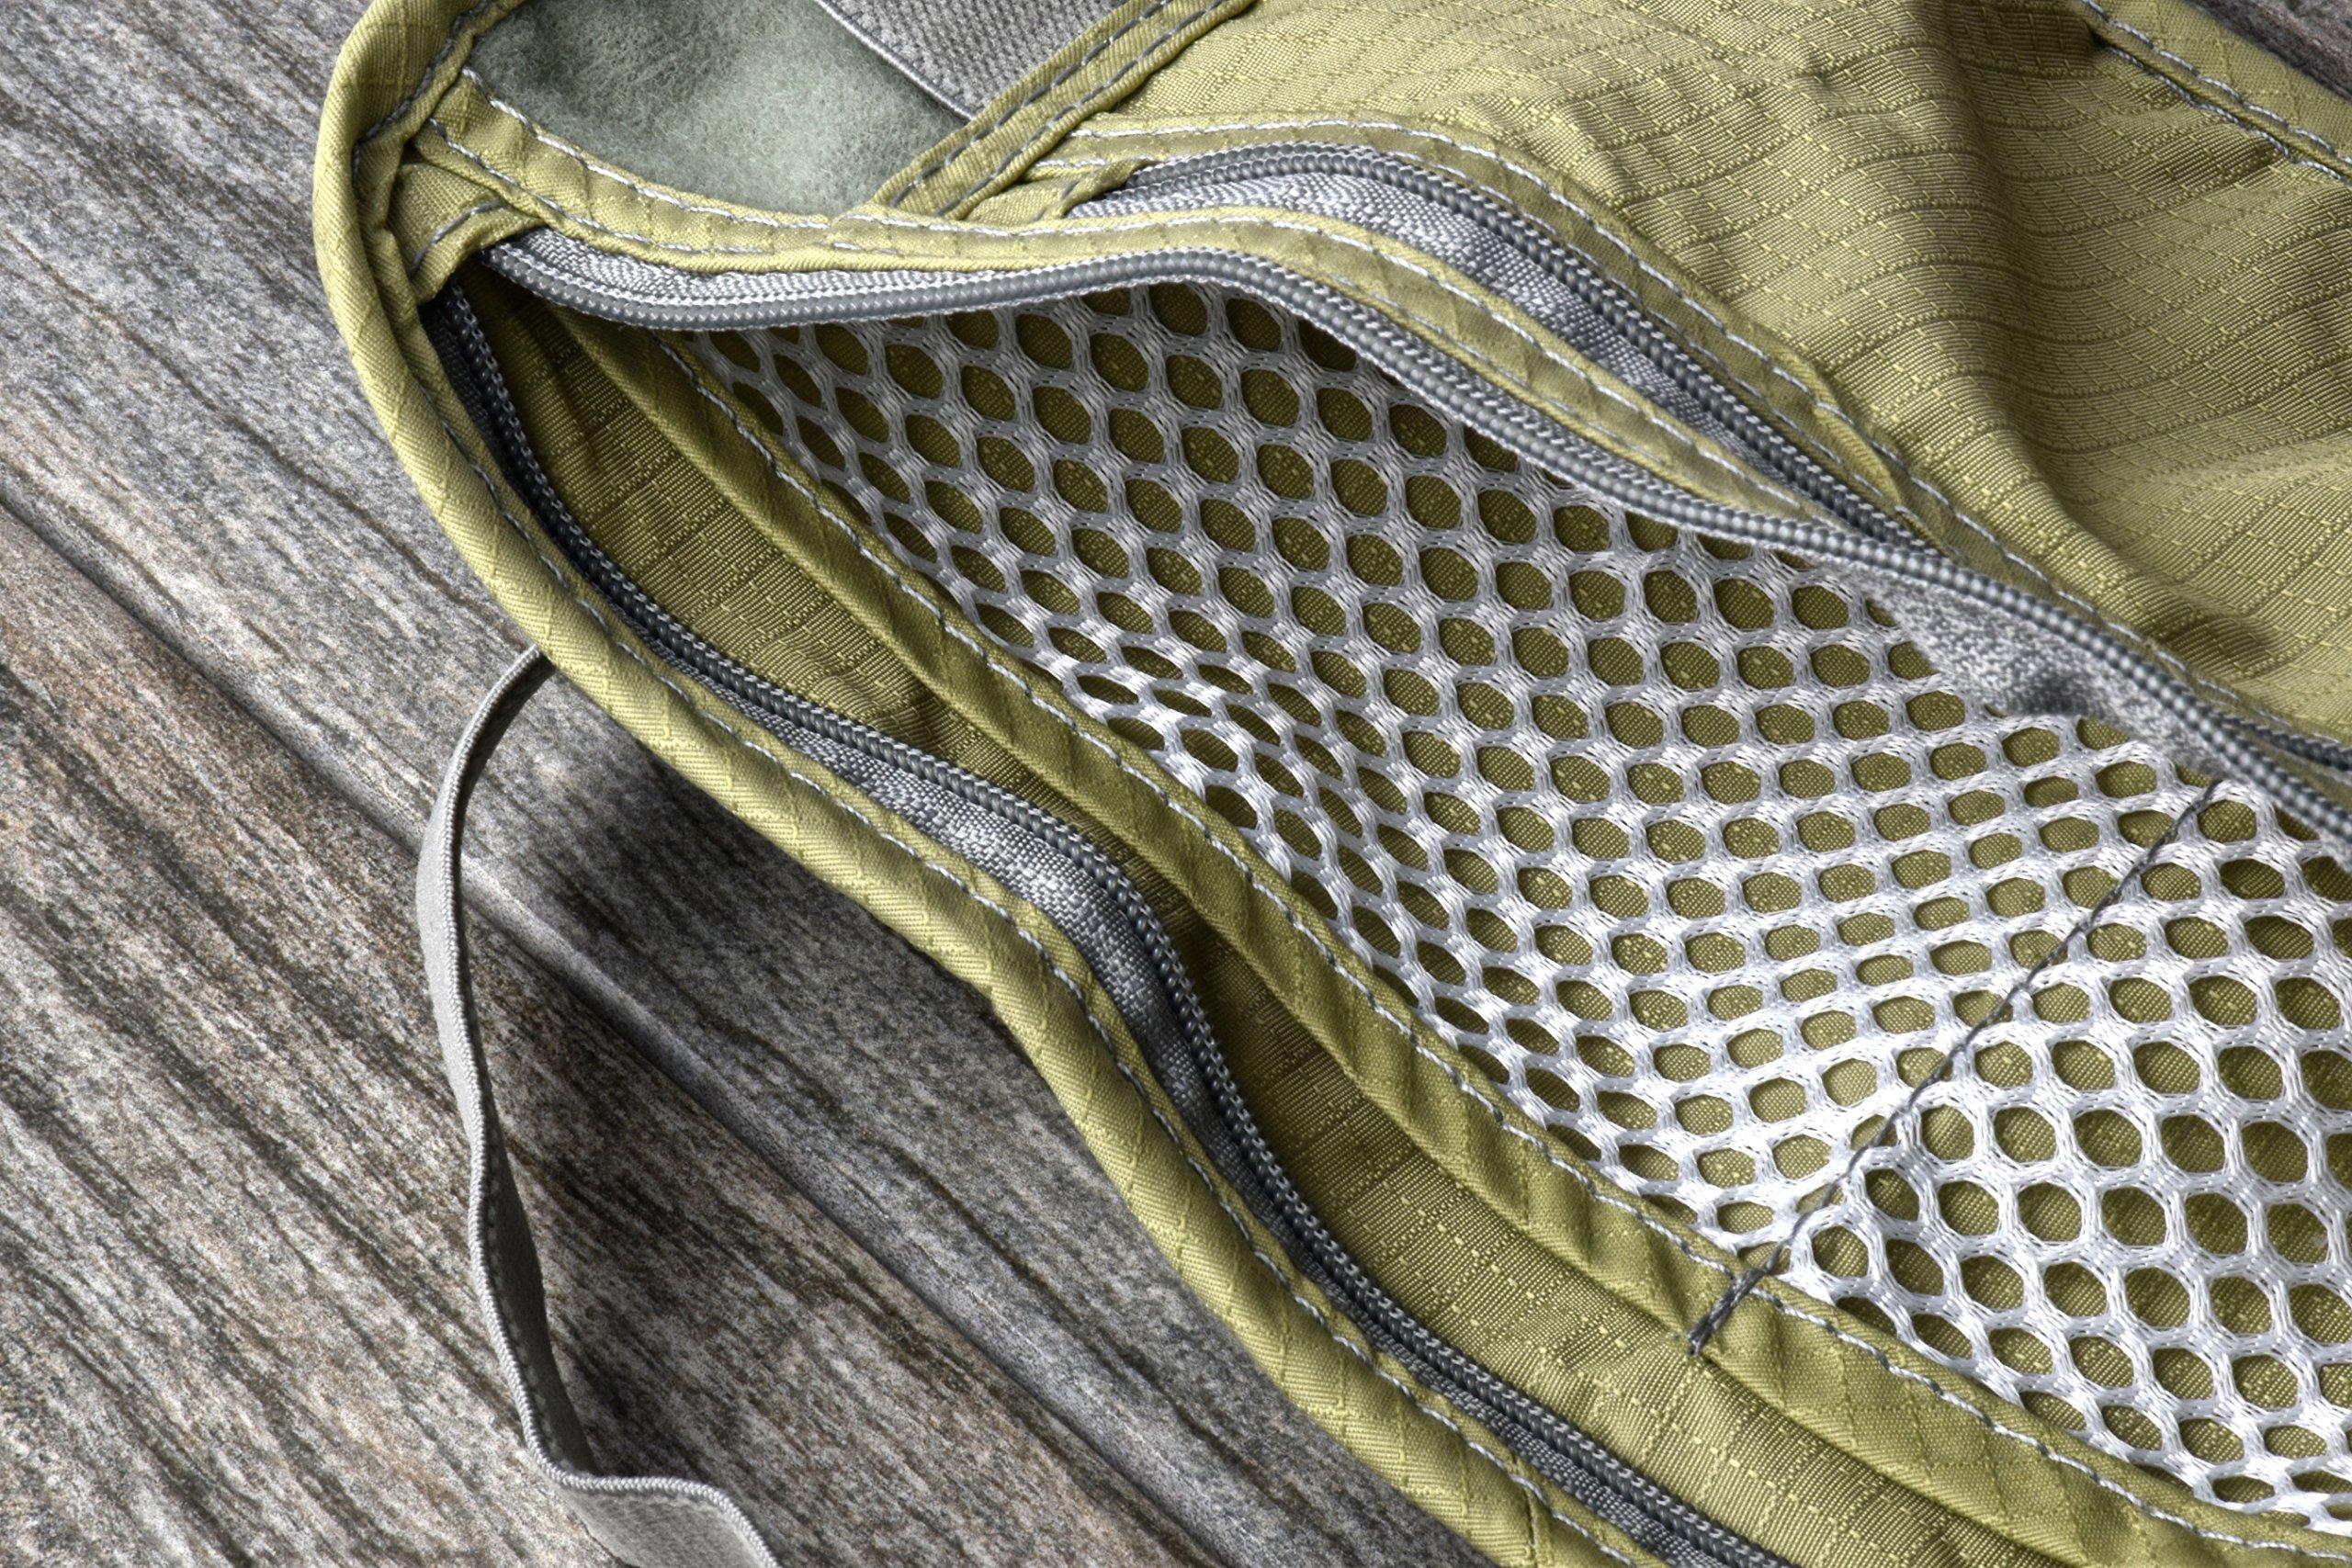 SE TP101-POUCH Concealed Dual Zipper Travel Pouch by SE (Image #4)